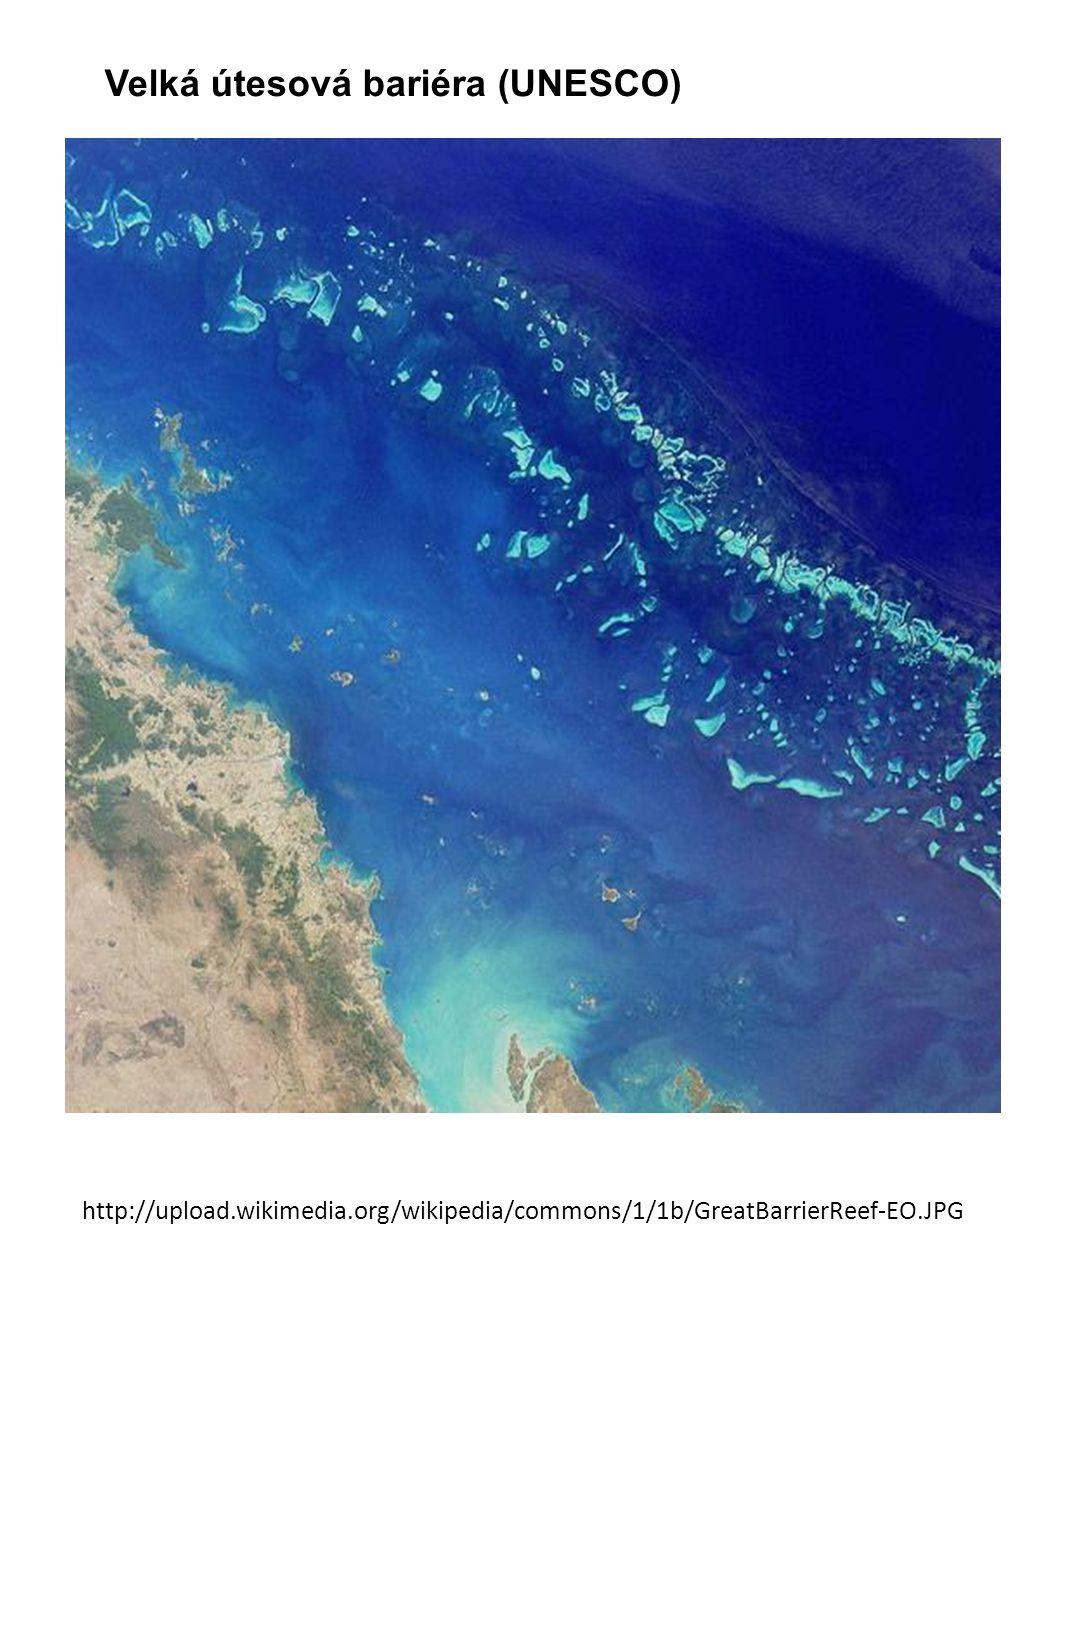 Velká útesová bariéra (UNESCO) http://upload.wikimedia.org/wikipedia/commons/1/1b/GreatBarrierReef-EO.JPG